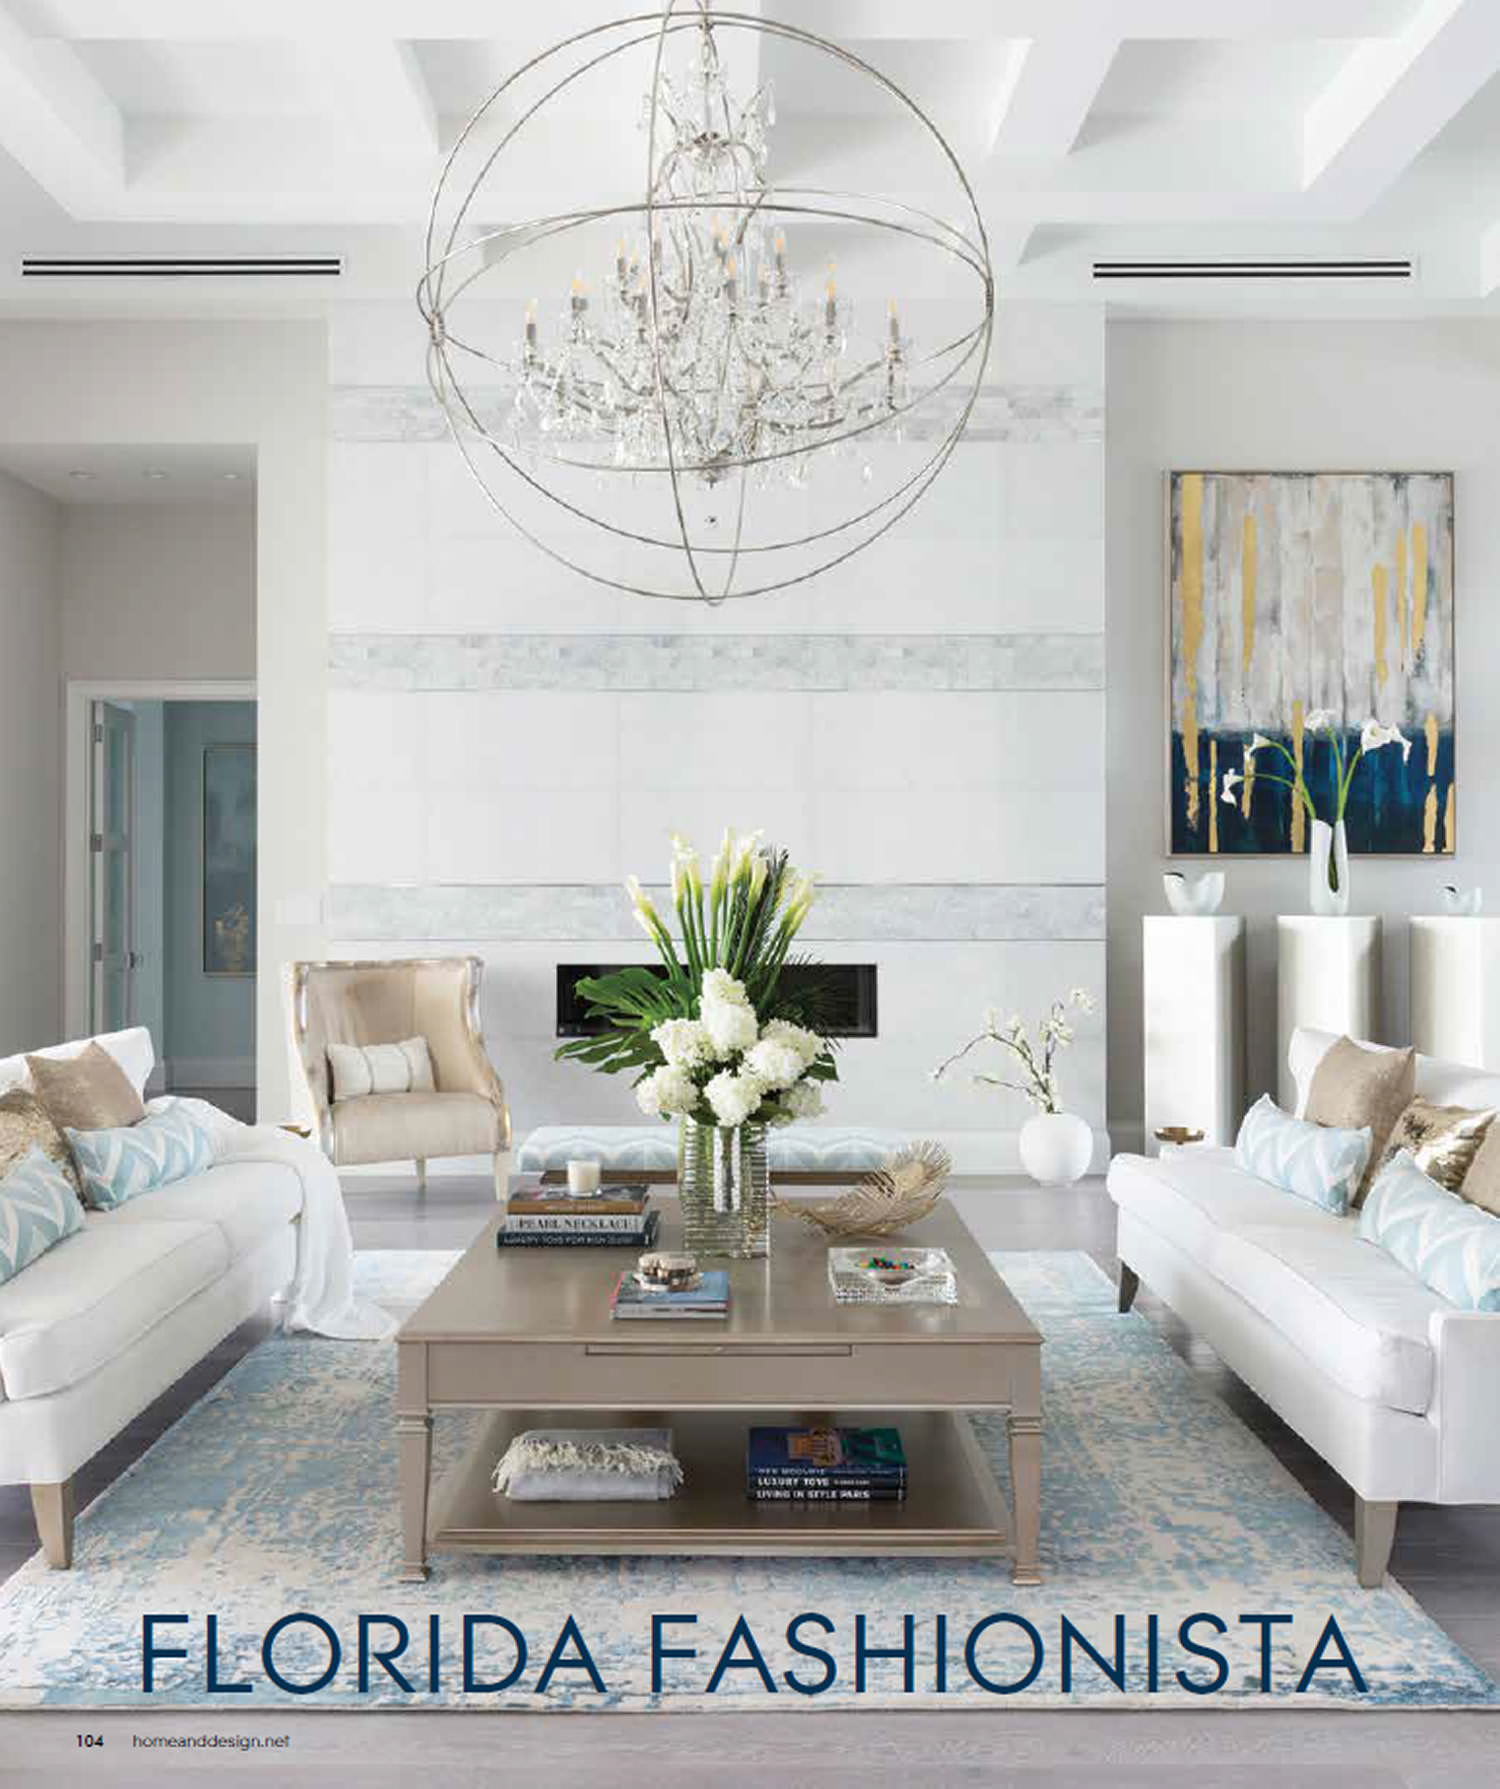 HOME & DESIGN: Florida Fashionista